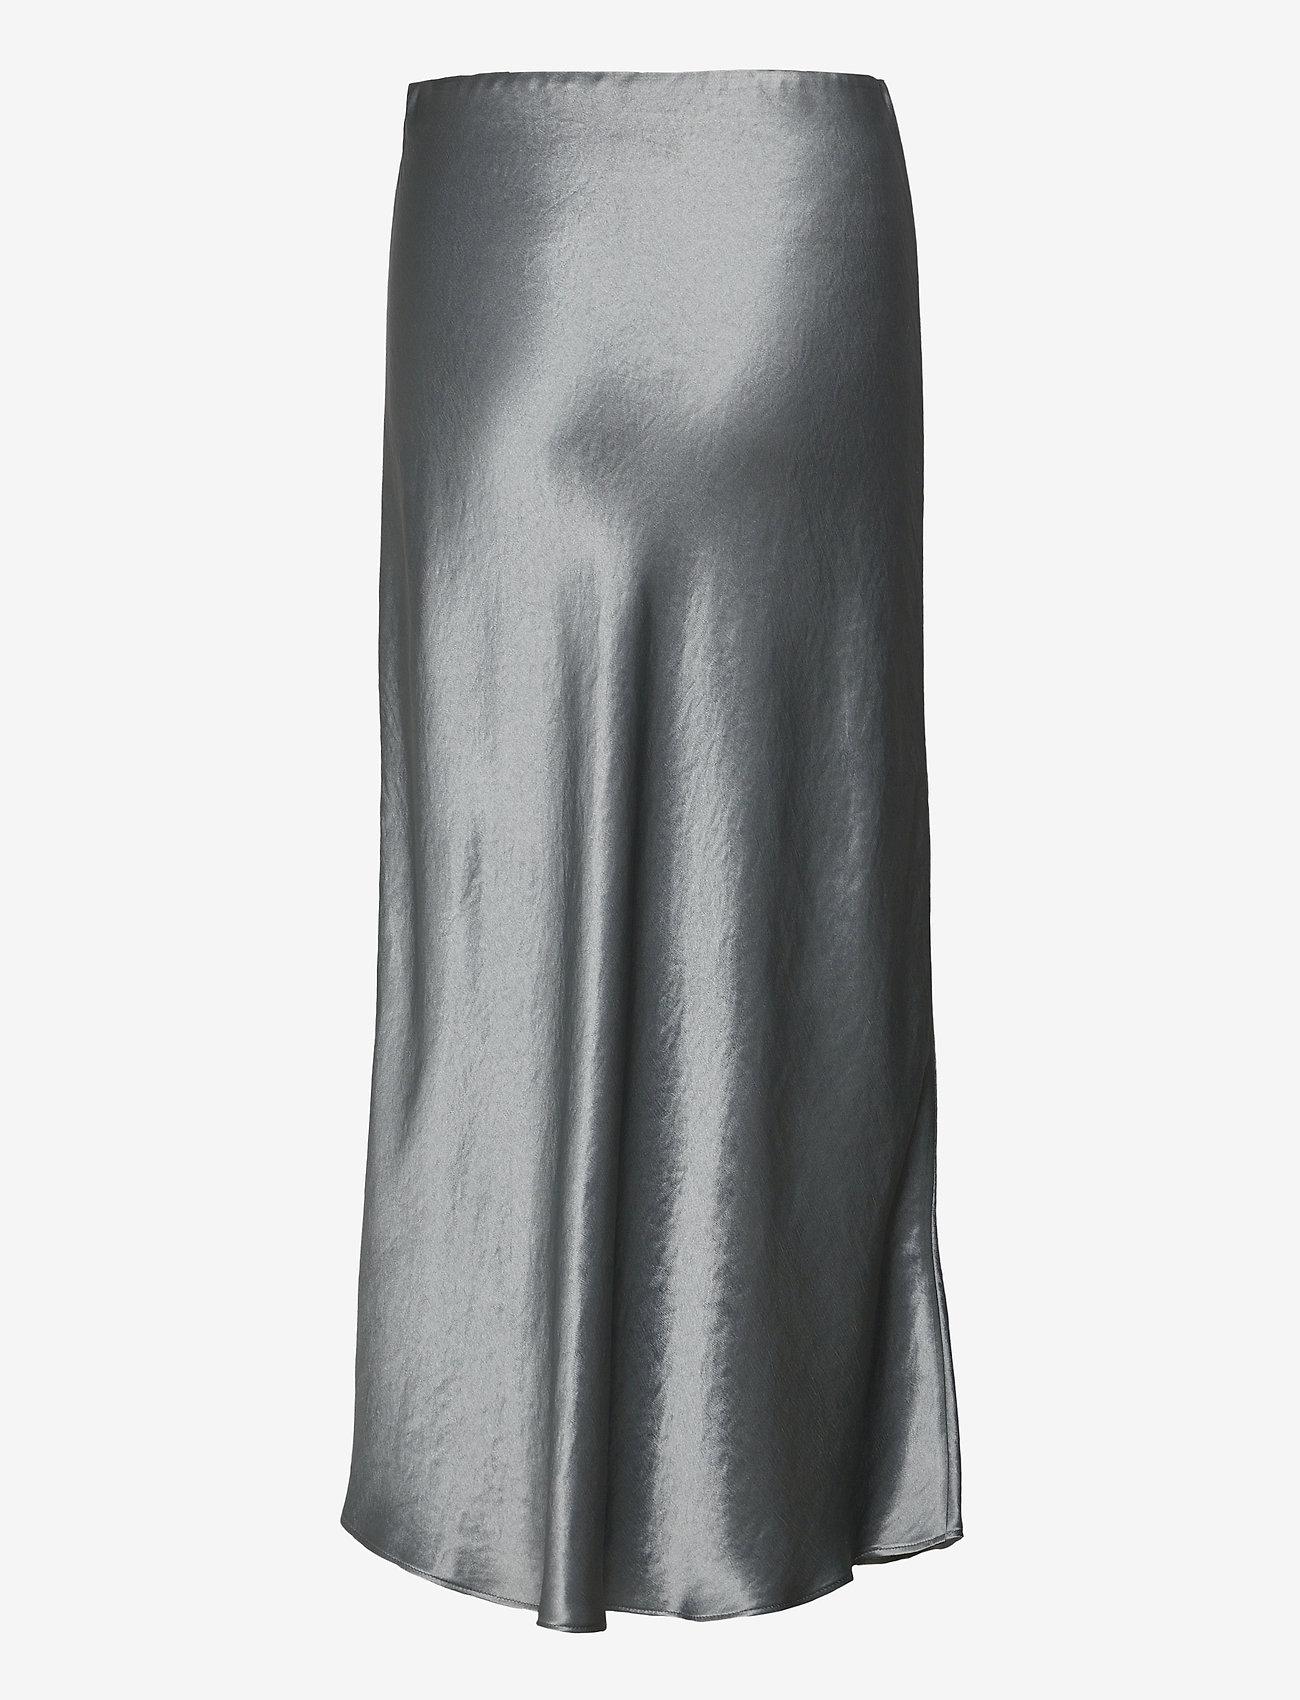 Max Mara Leisure - ALESSIO - midi skirts - medium grey - 1